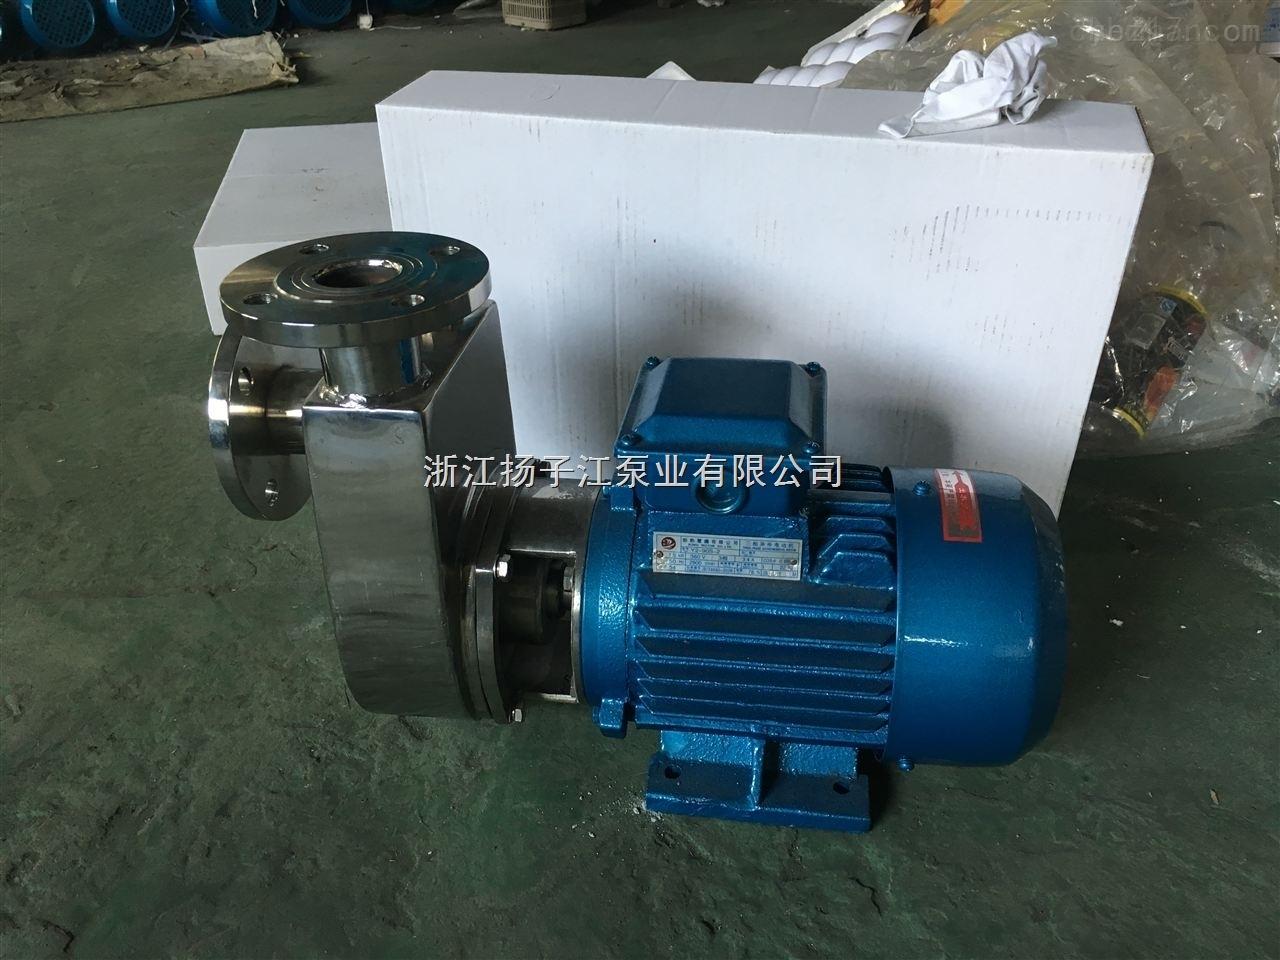 50SFB-18不锈钢离心泵 304 316化工泵 小型防腐蚀水泵 耐酸碱卫生级食品泵